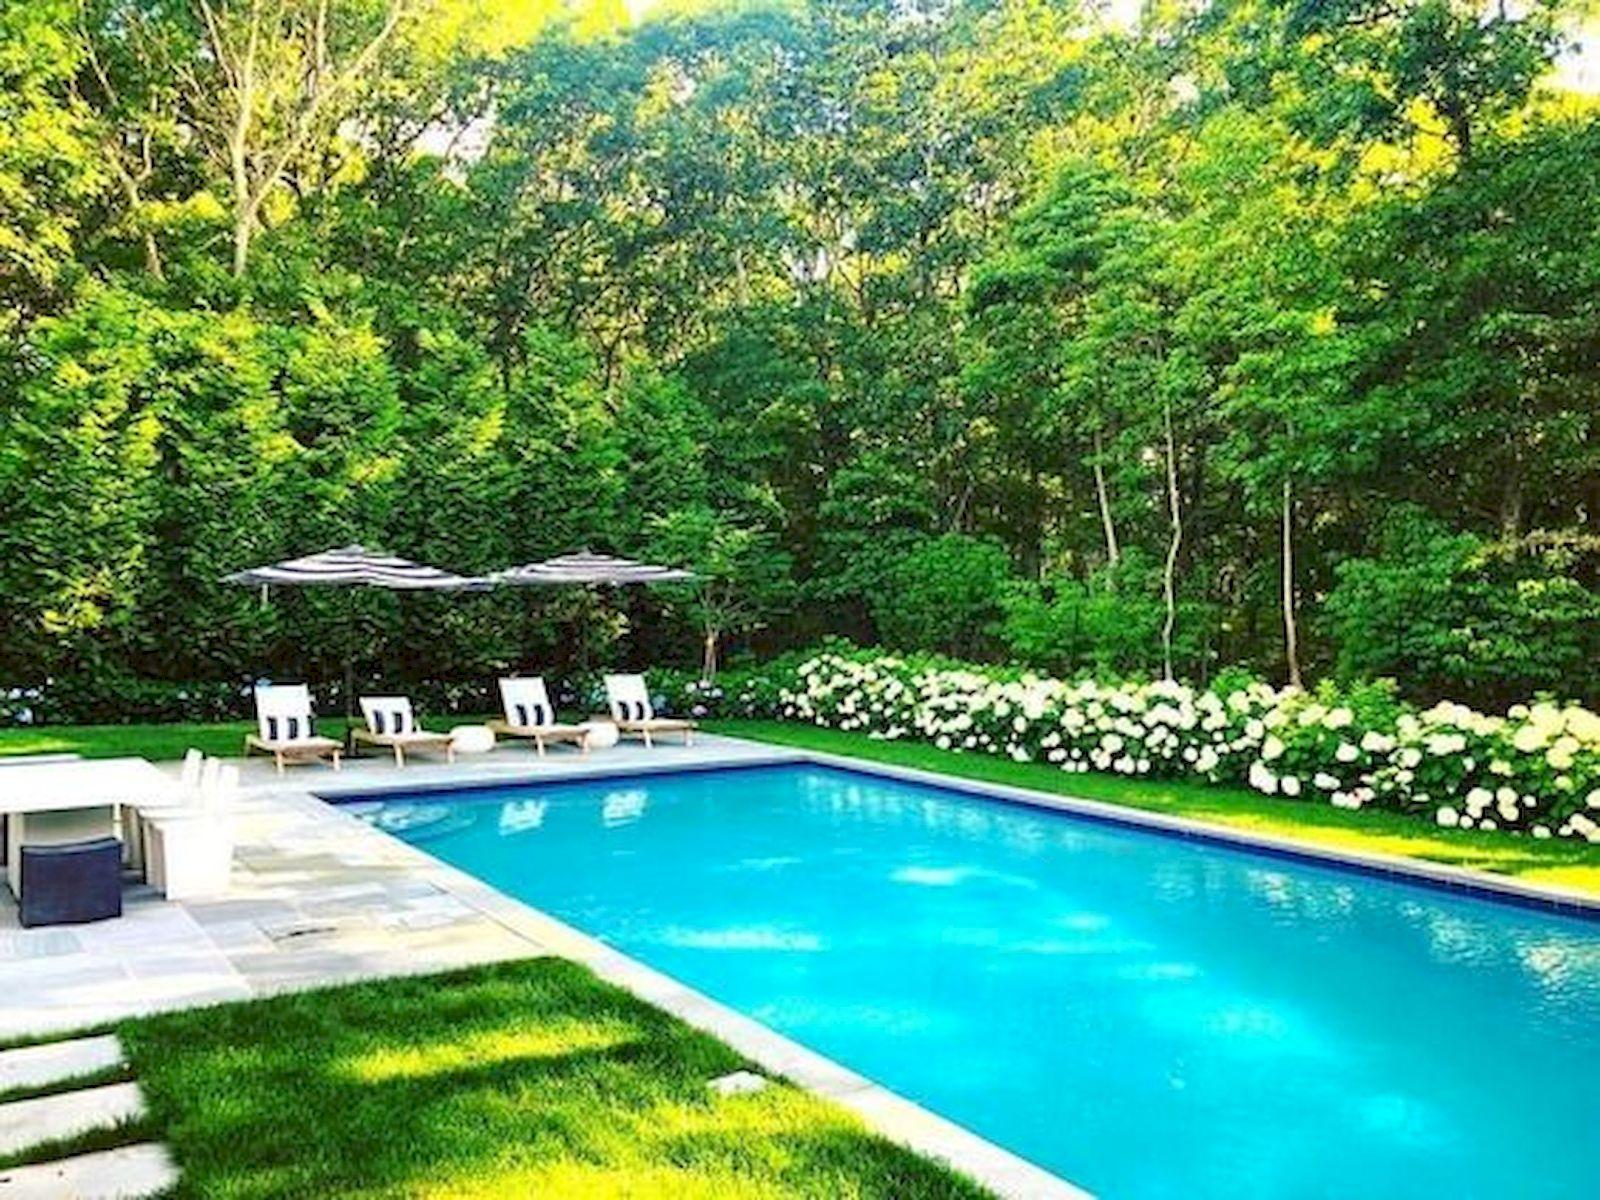 46 Fantastic Modern Swimming Pool Design Ideas (7)